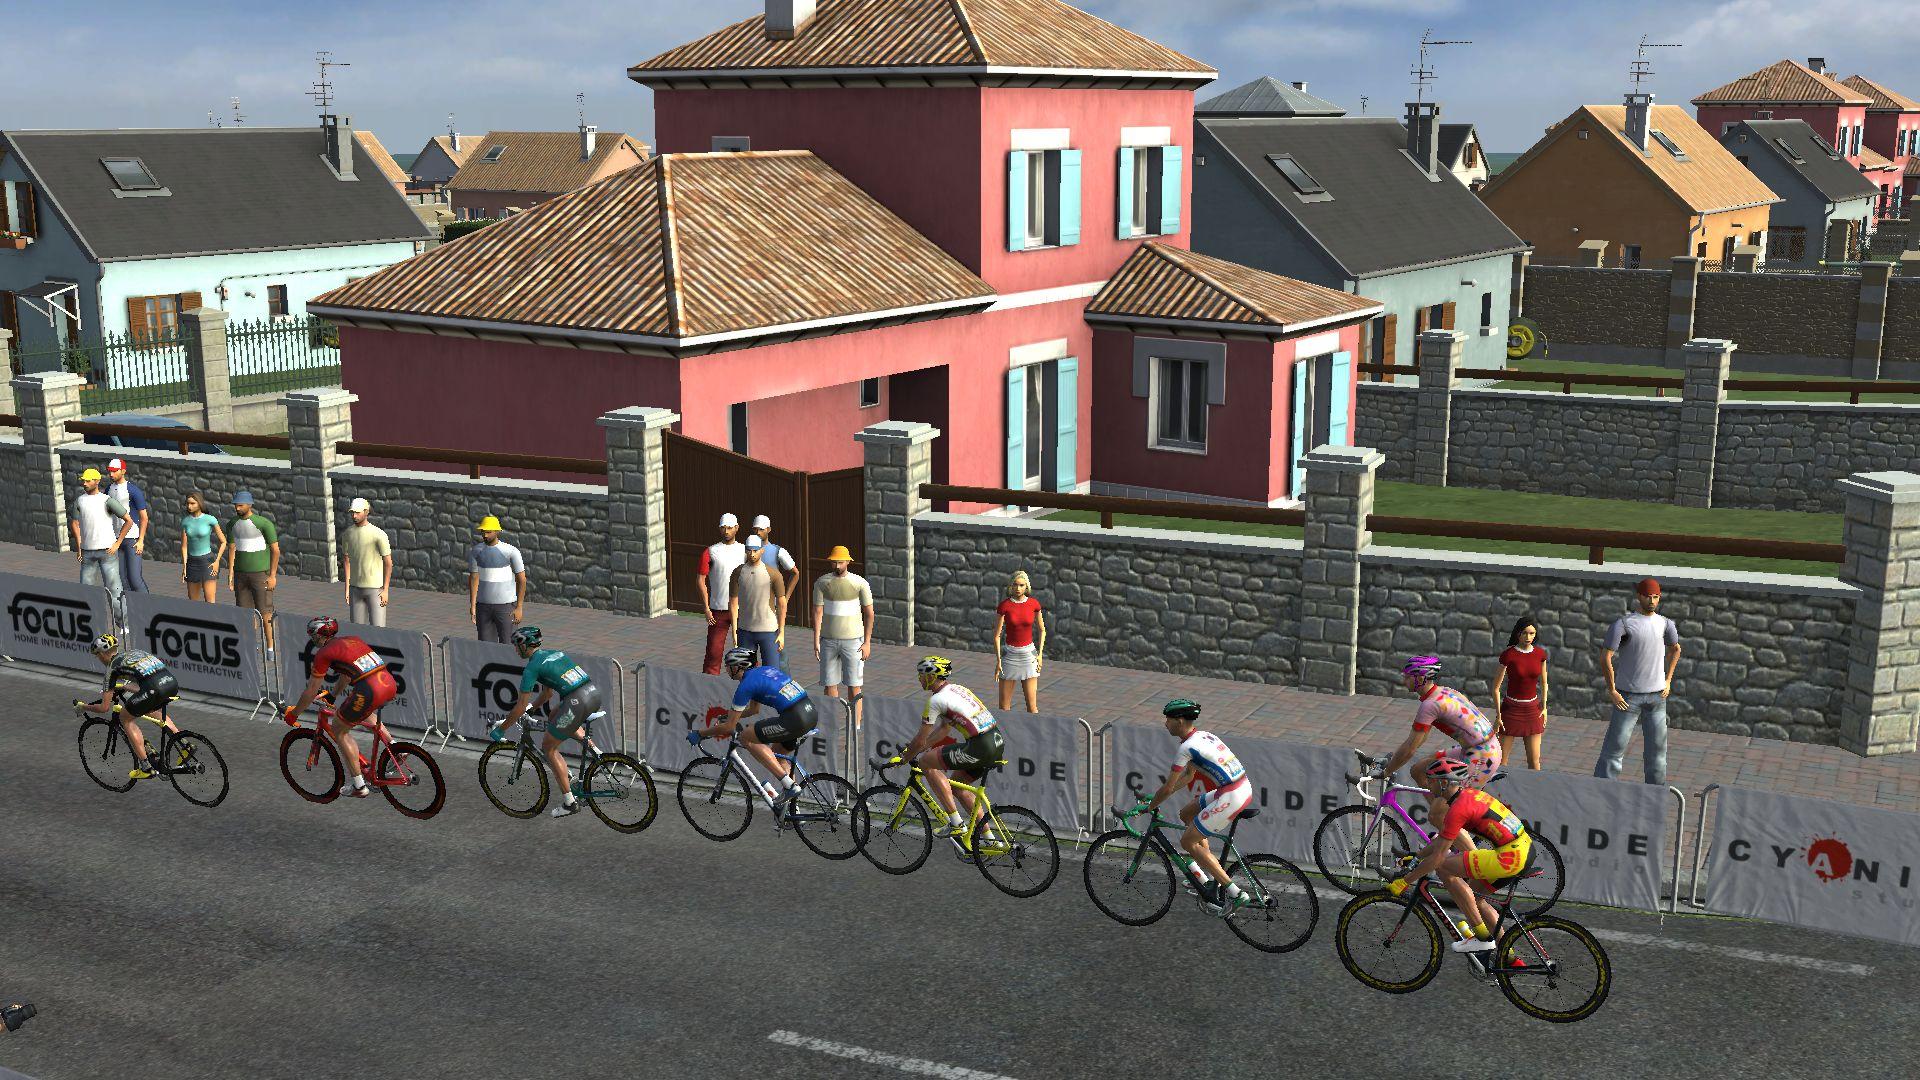 pcmdaily.com/images/mg/2019/Races/GTM/Giro/mg19_giro_12_PCM0047.jpg